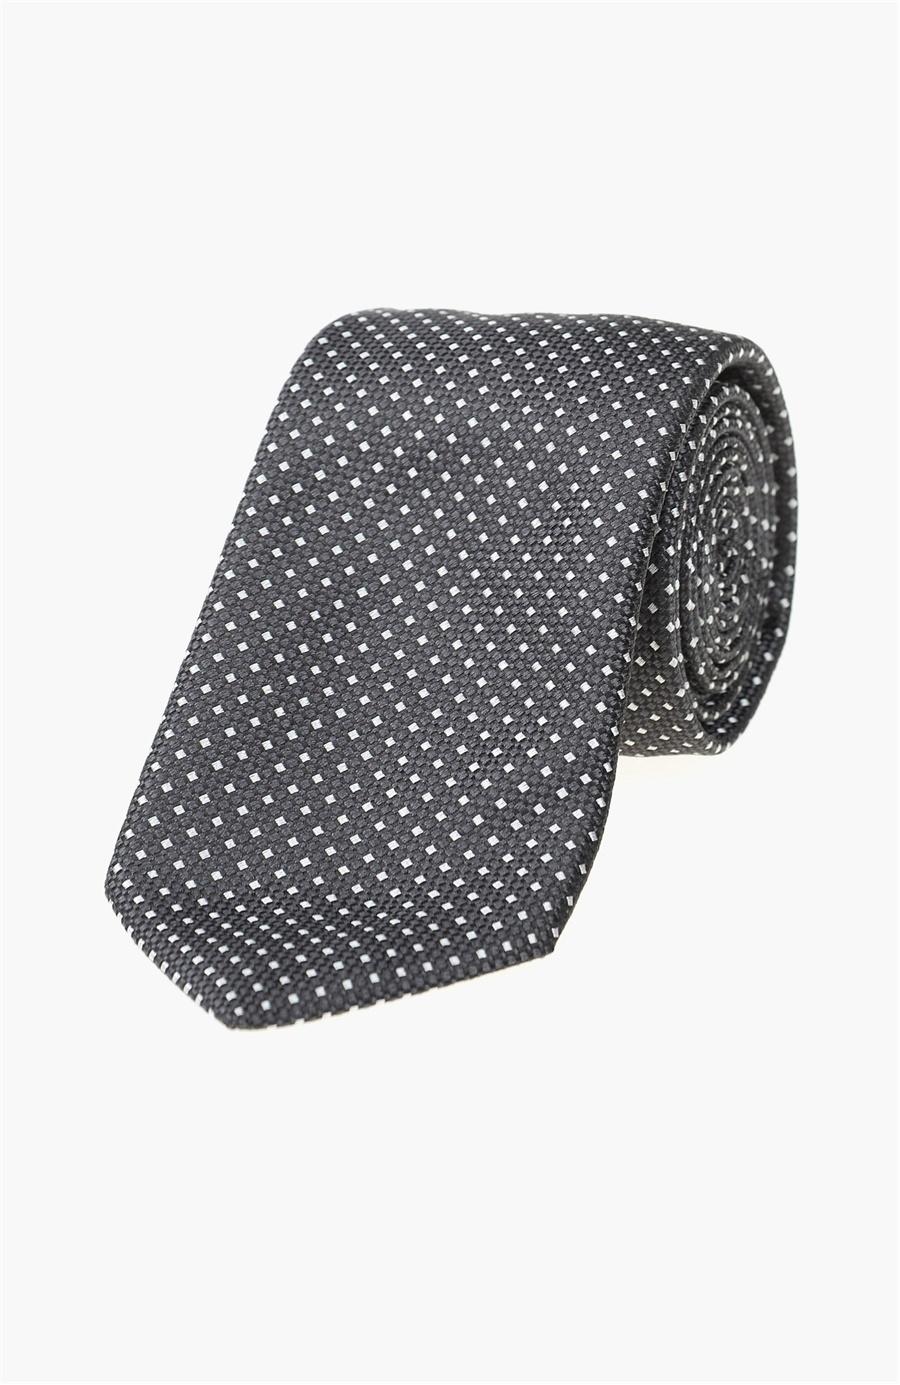 2019 Siyah Beyaz Kravat